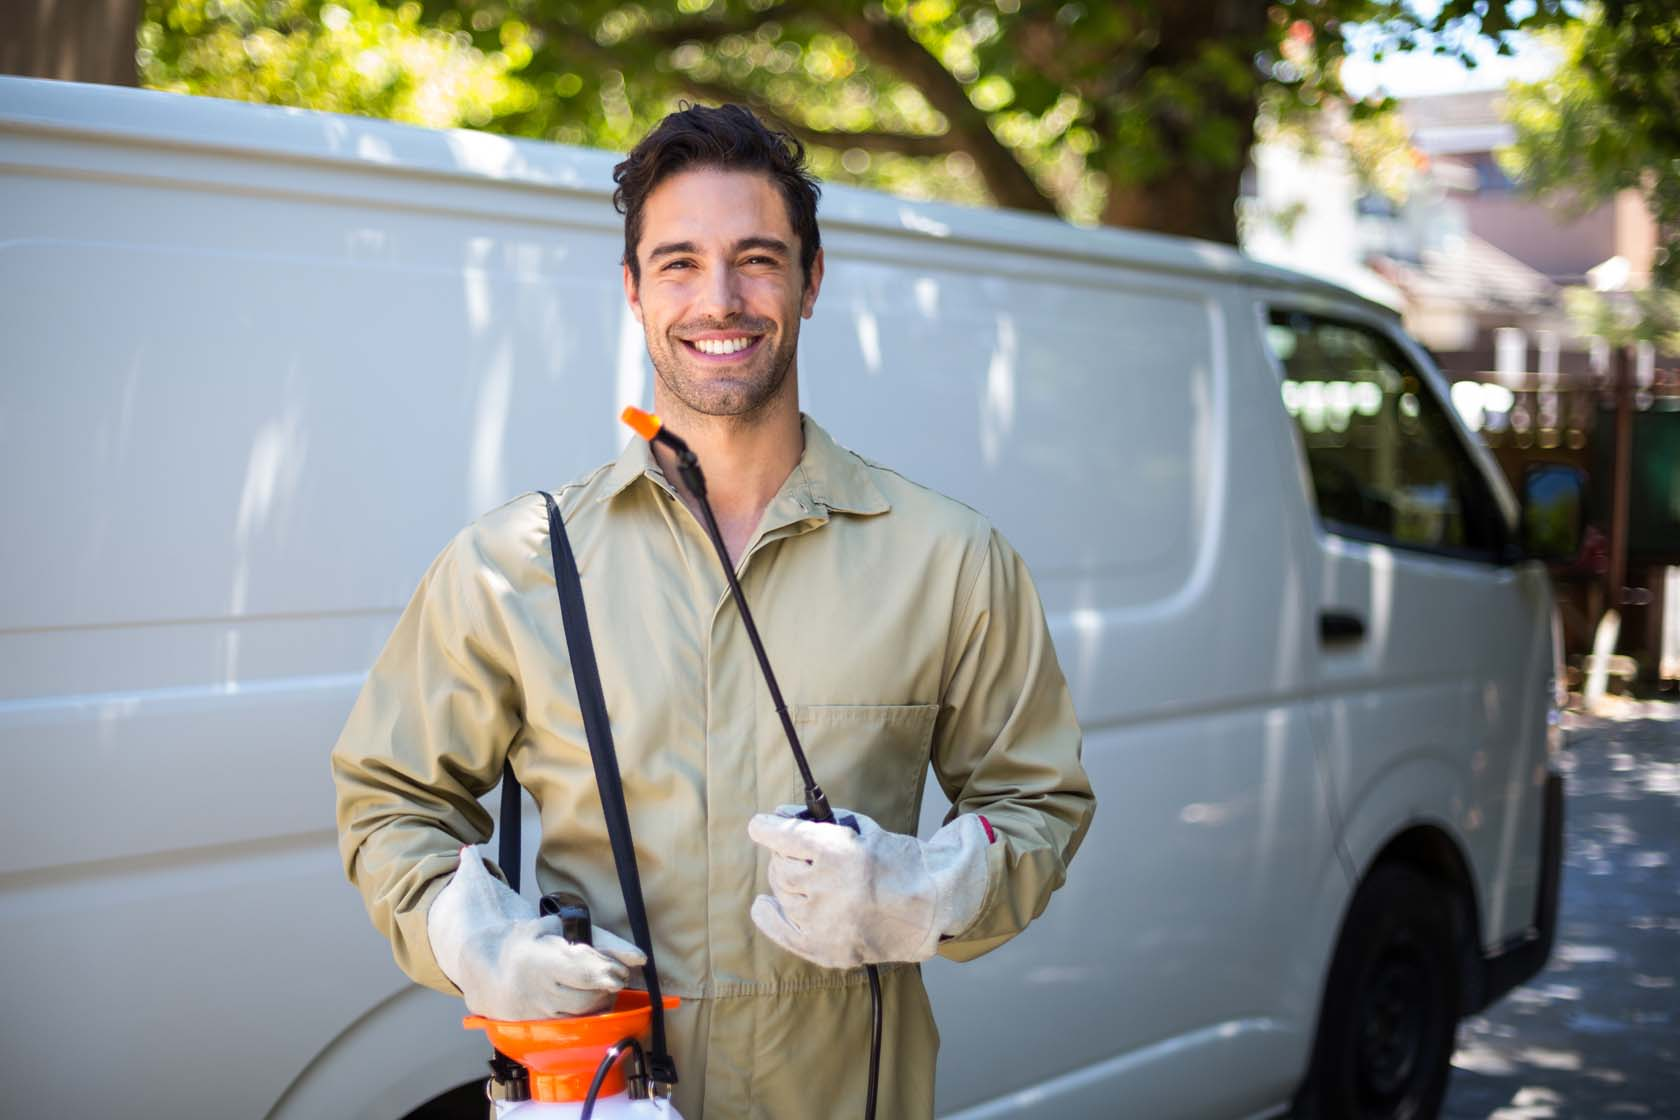 Pest Control Company Services Provider